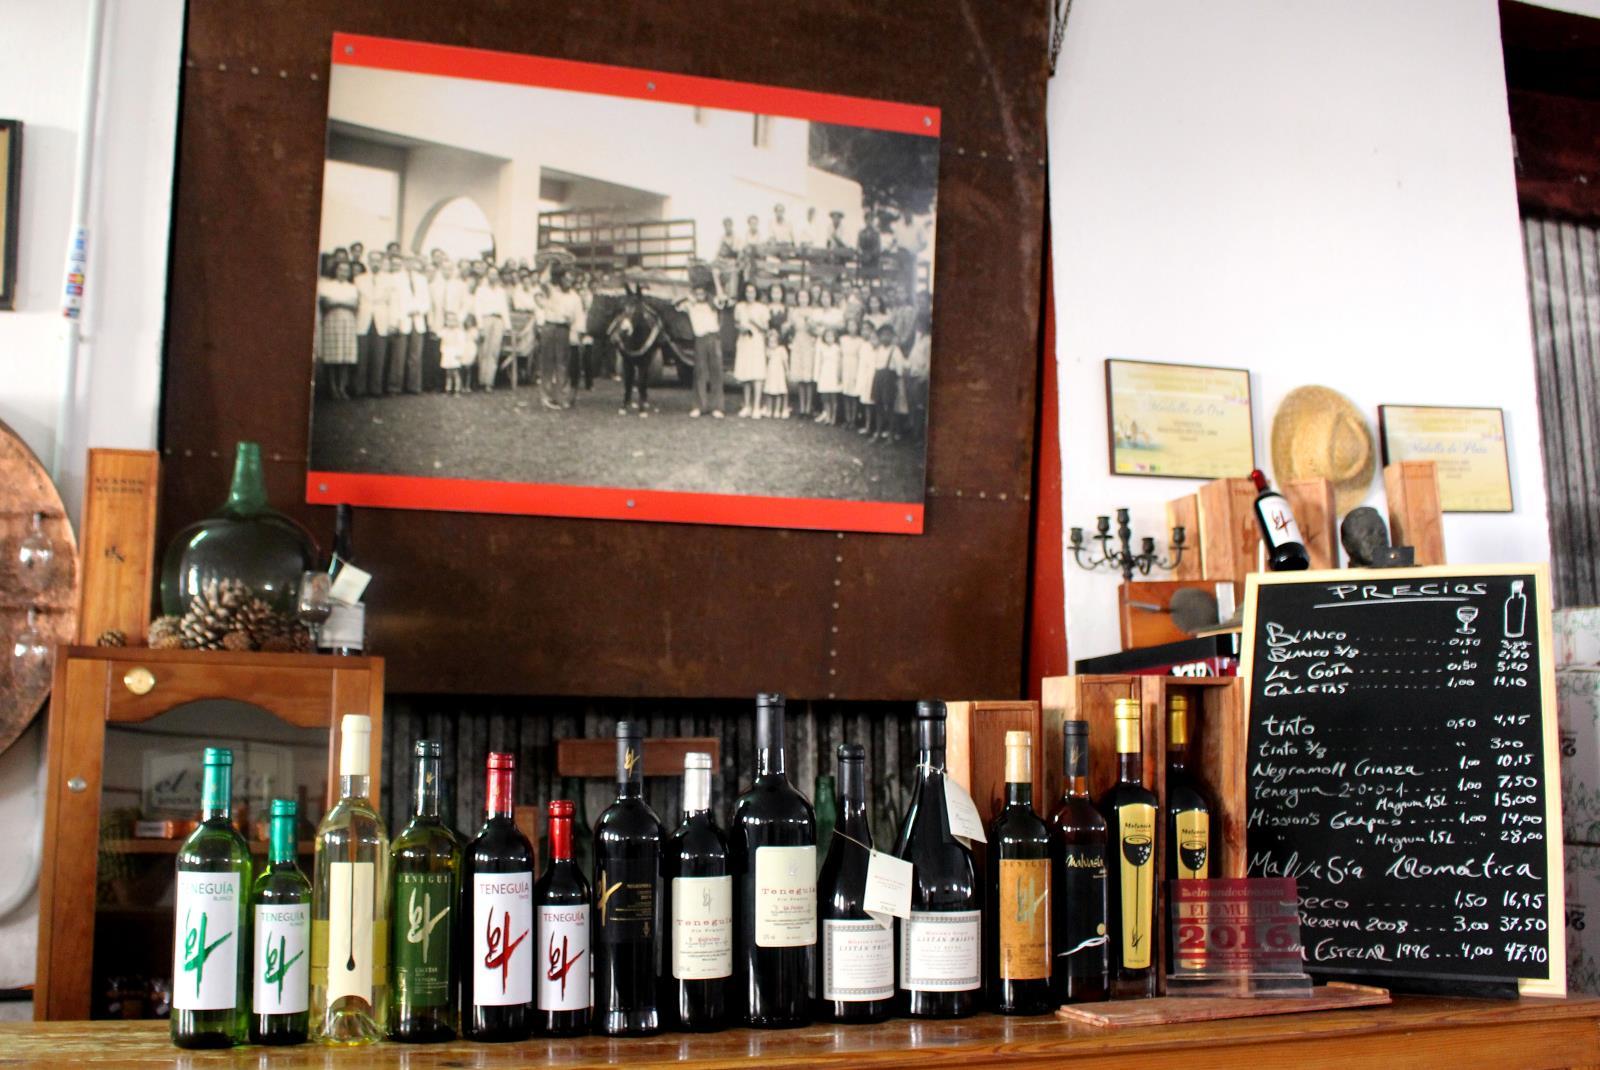 Visit-Bodegas-Teneguia-winery-with-wine-Tasting-7